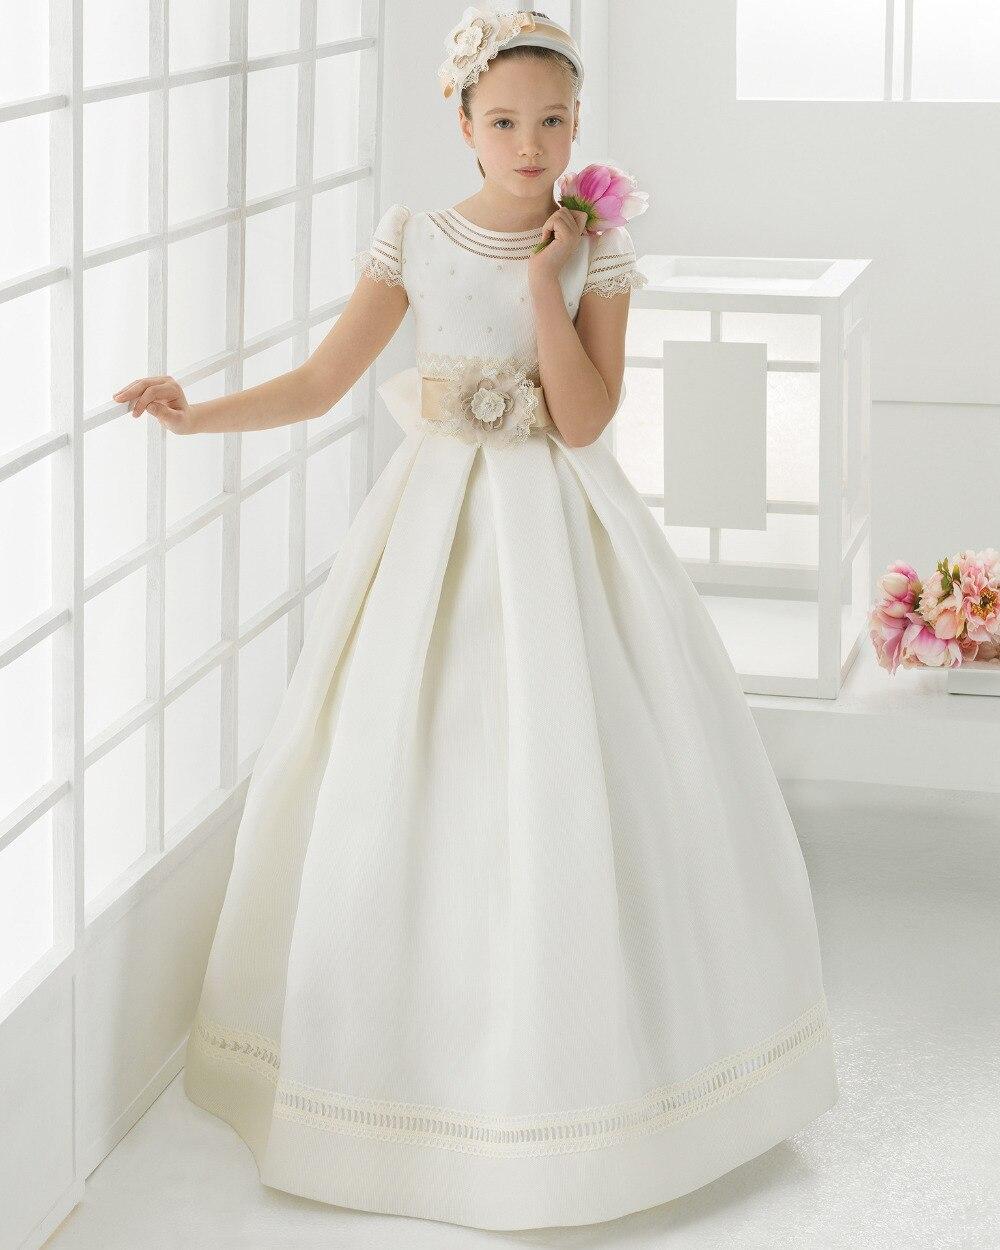 Tank Long Vestido De Daminha 2019 Hot Sales Ivory Lace   Flower     Girl     Dresses   First Communion   Dresses   Belt 2-14